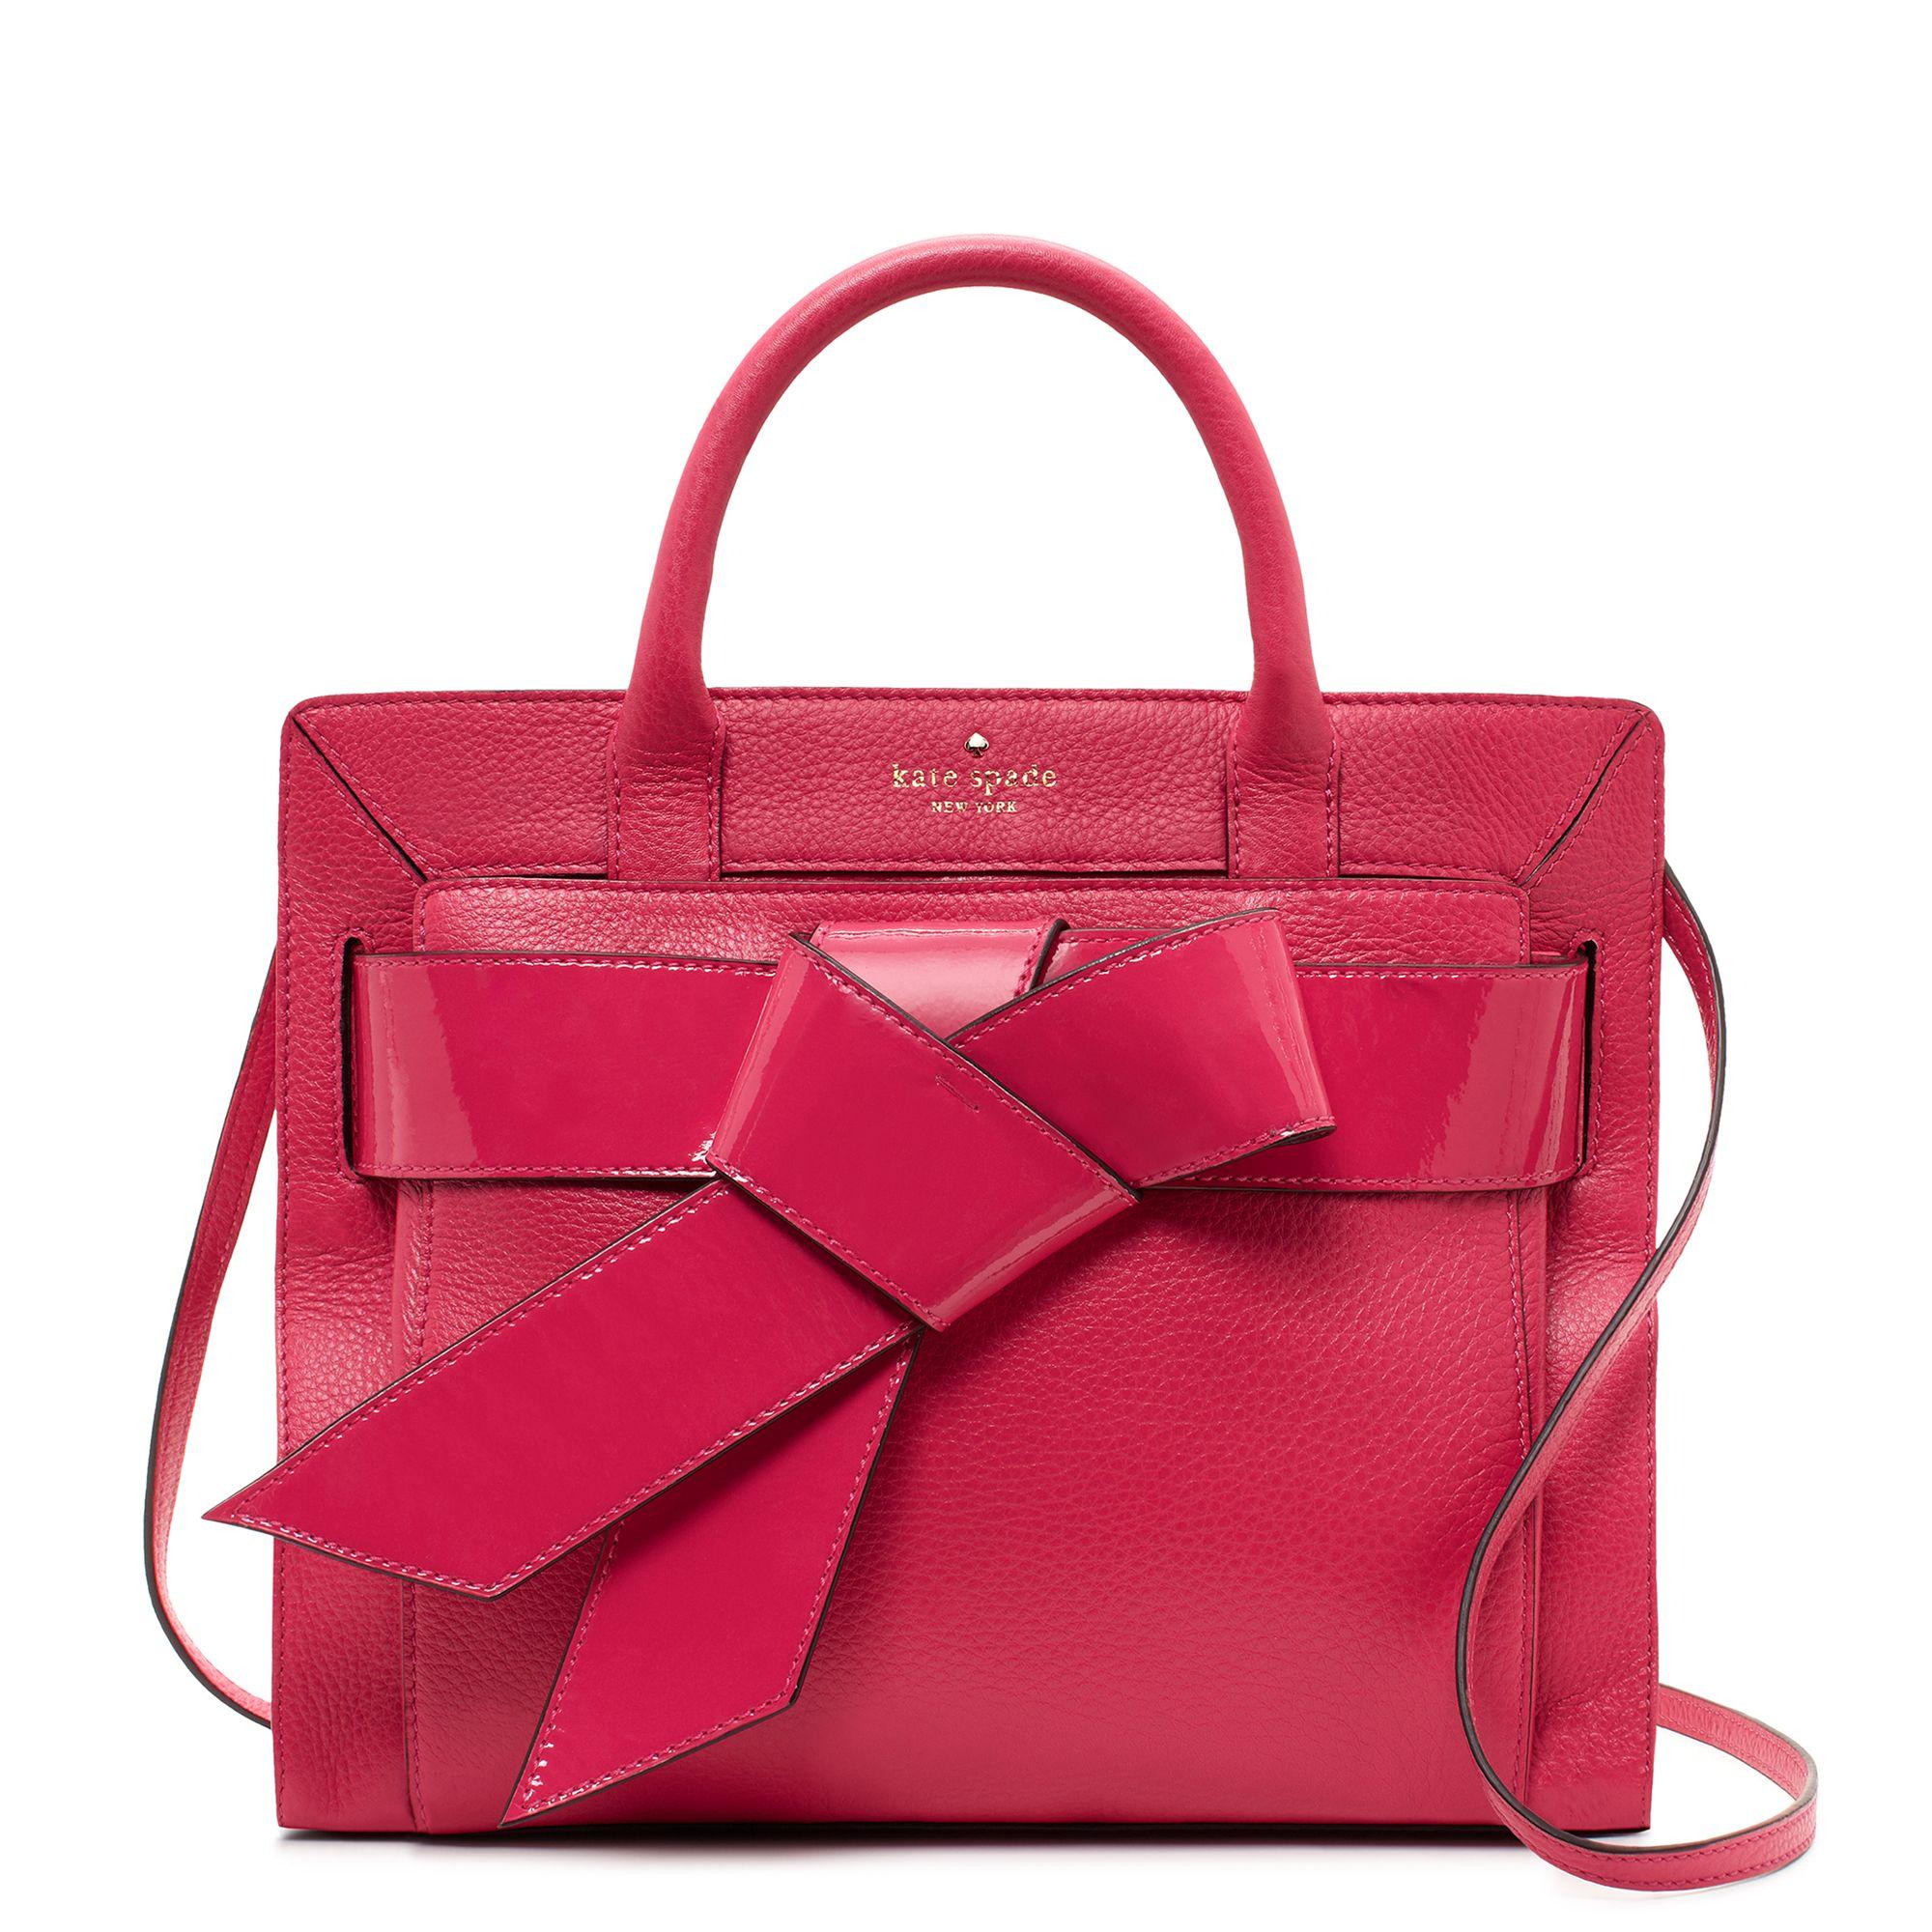 3be2612c839c Kate Spade New York Bow Valley Rosa Crossbody Satchel Handbag Red